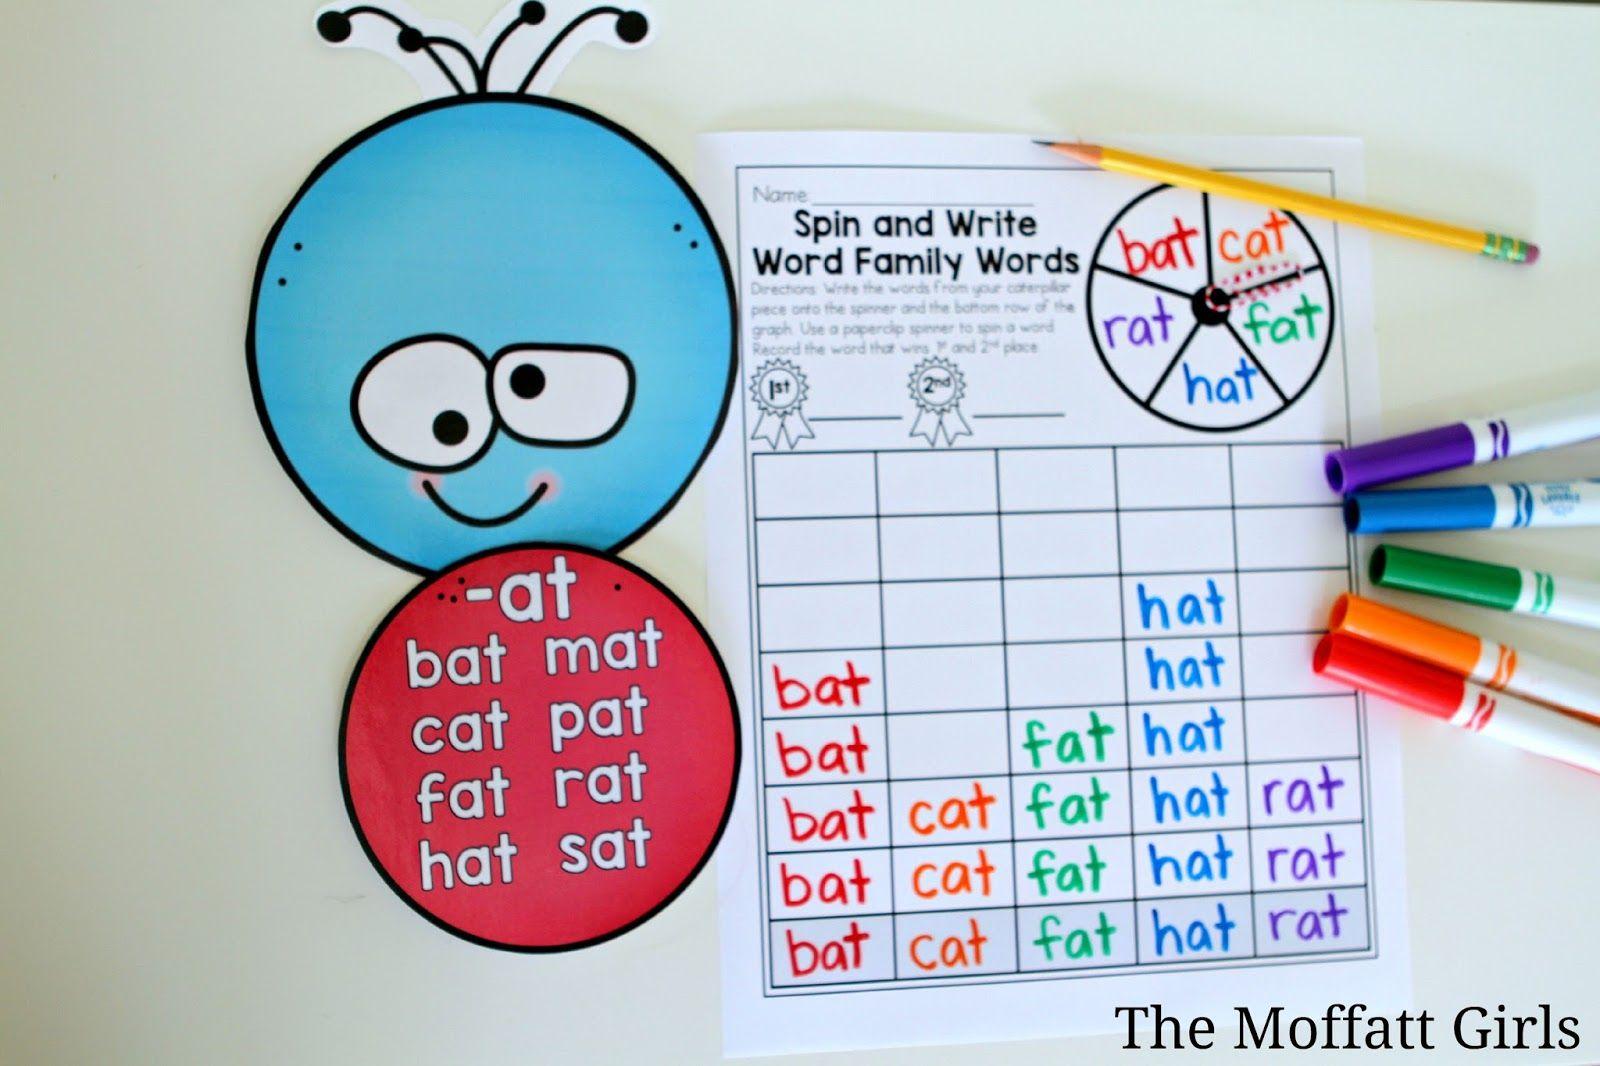 The Moffatt Girls Word Family Caterpillar